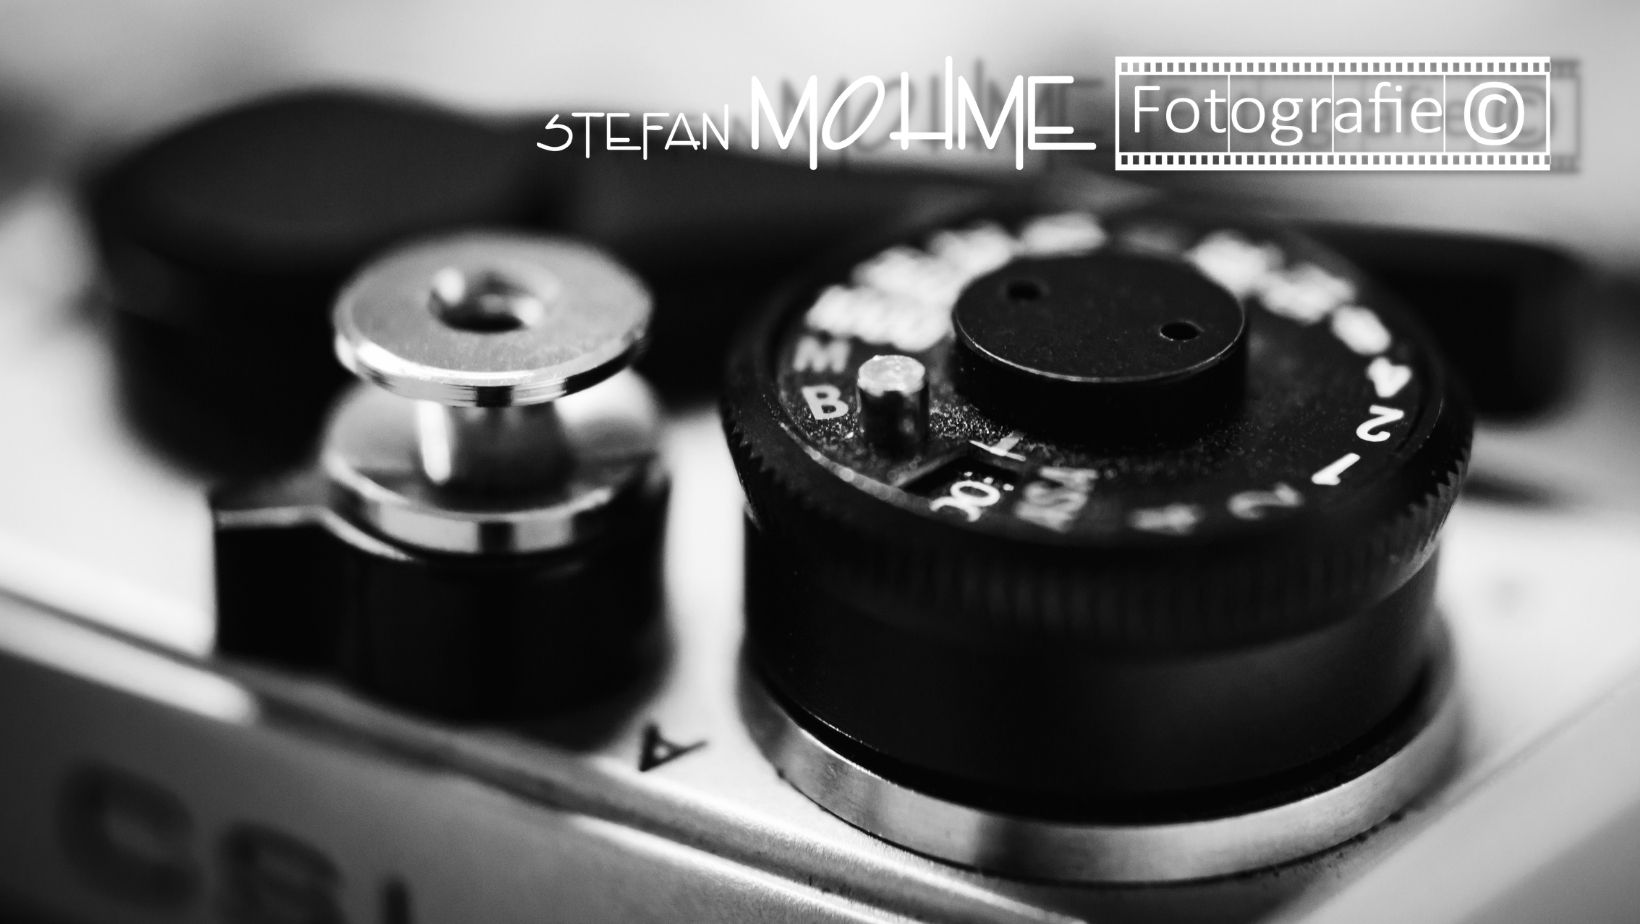 Kameraauslöser, und Logo Stefan Mohme,Nikon